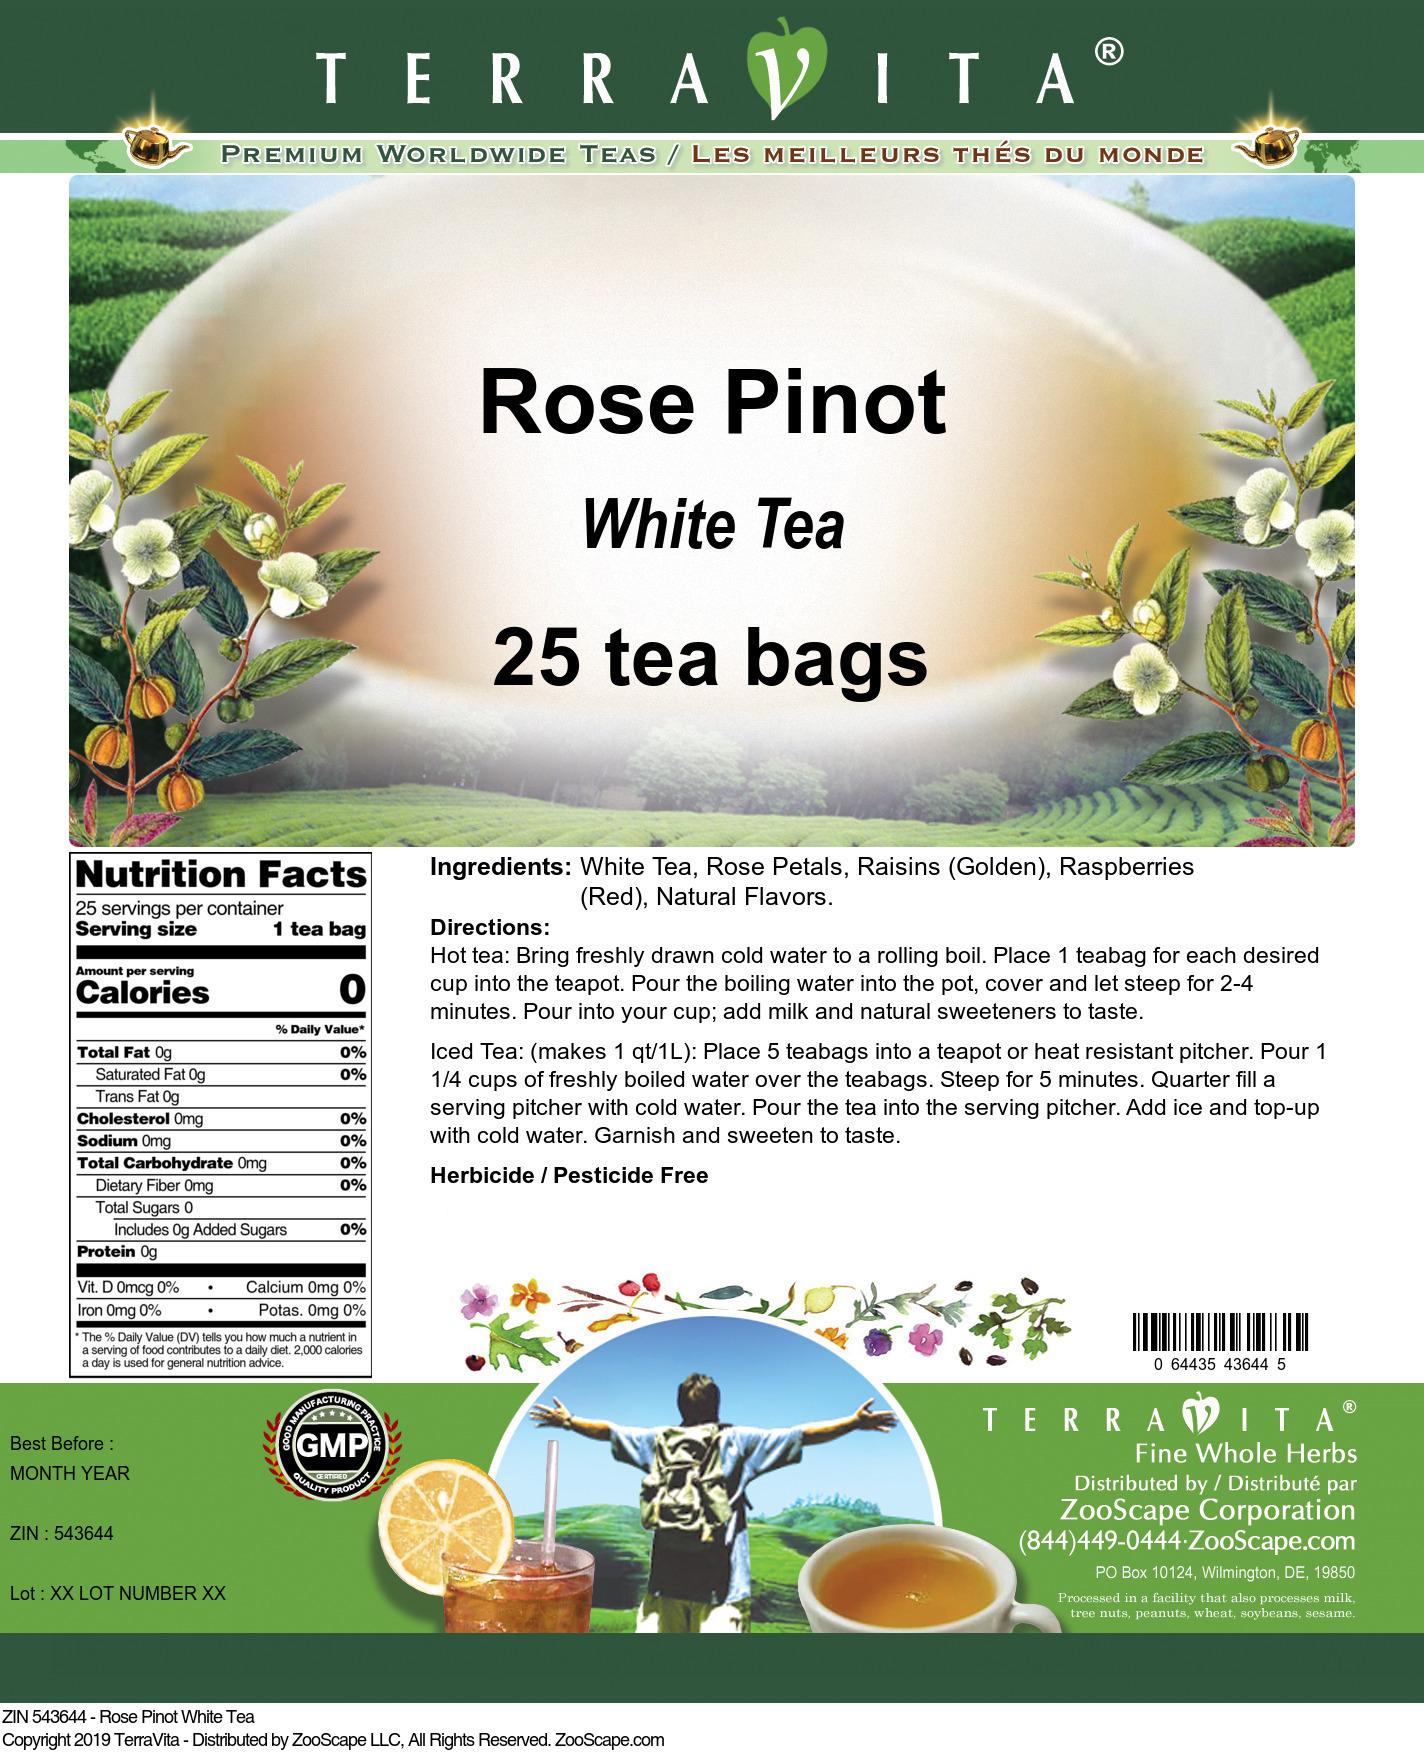 Rose Pinot White Tea